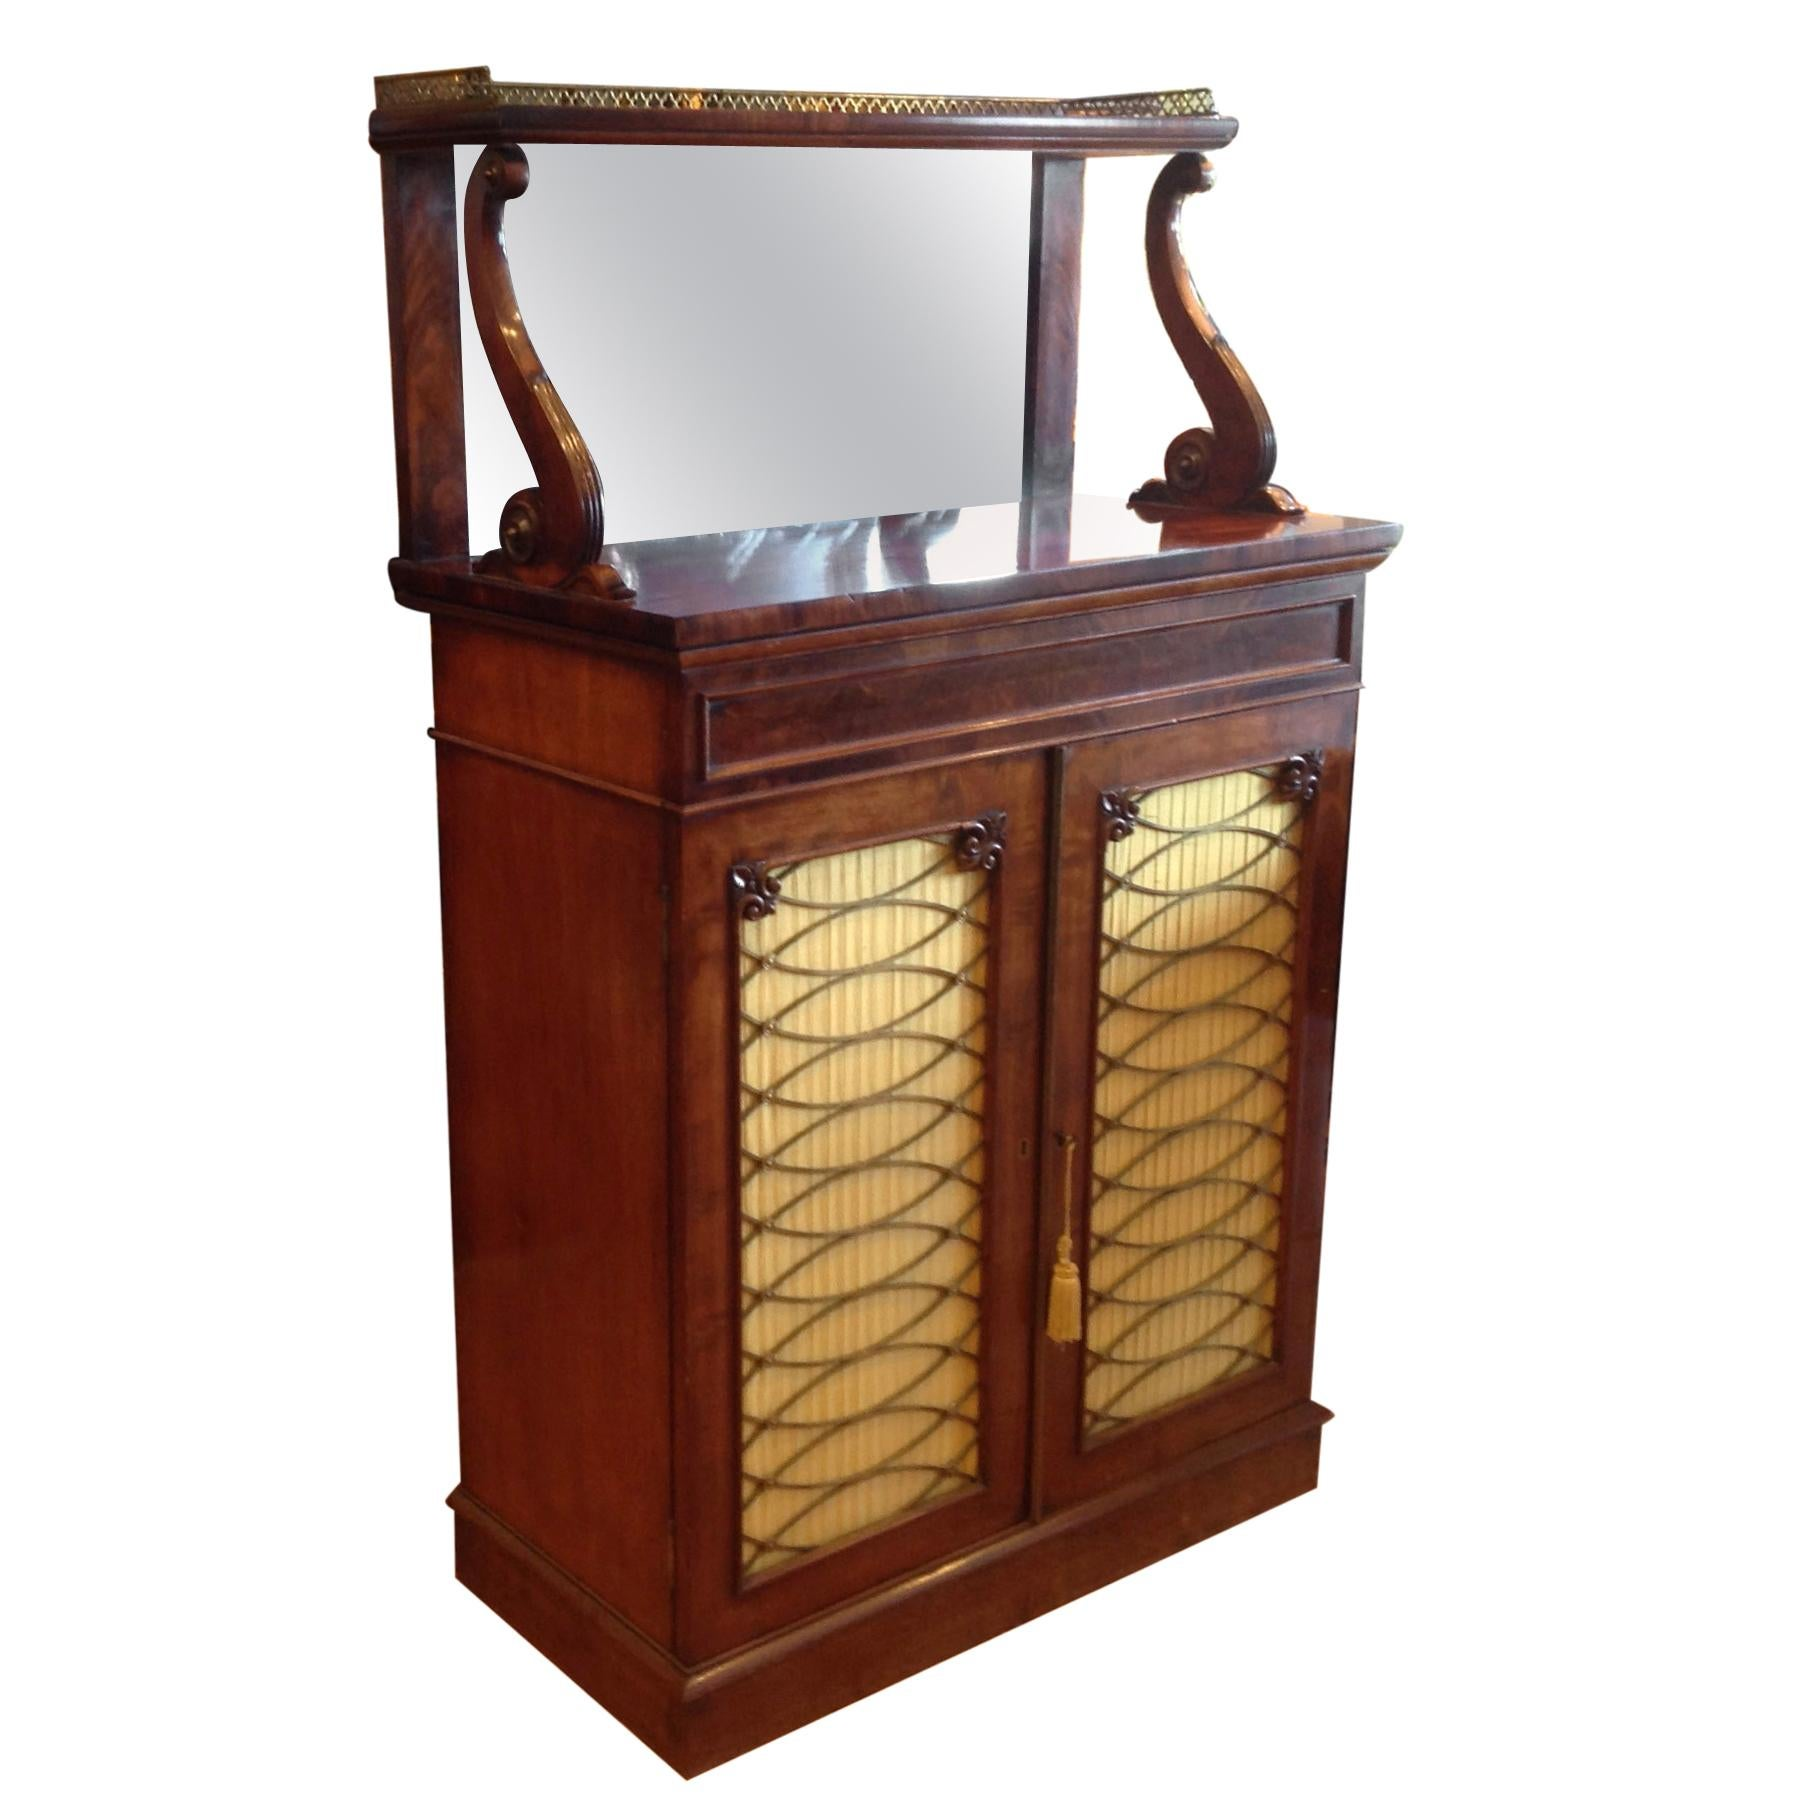 19th Century English Dry Bar / Chiffonier